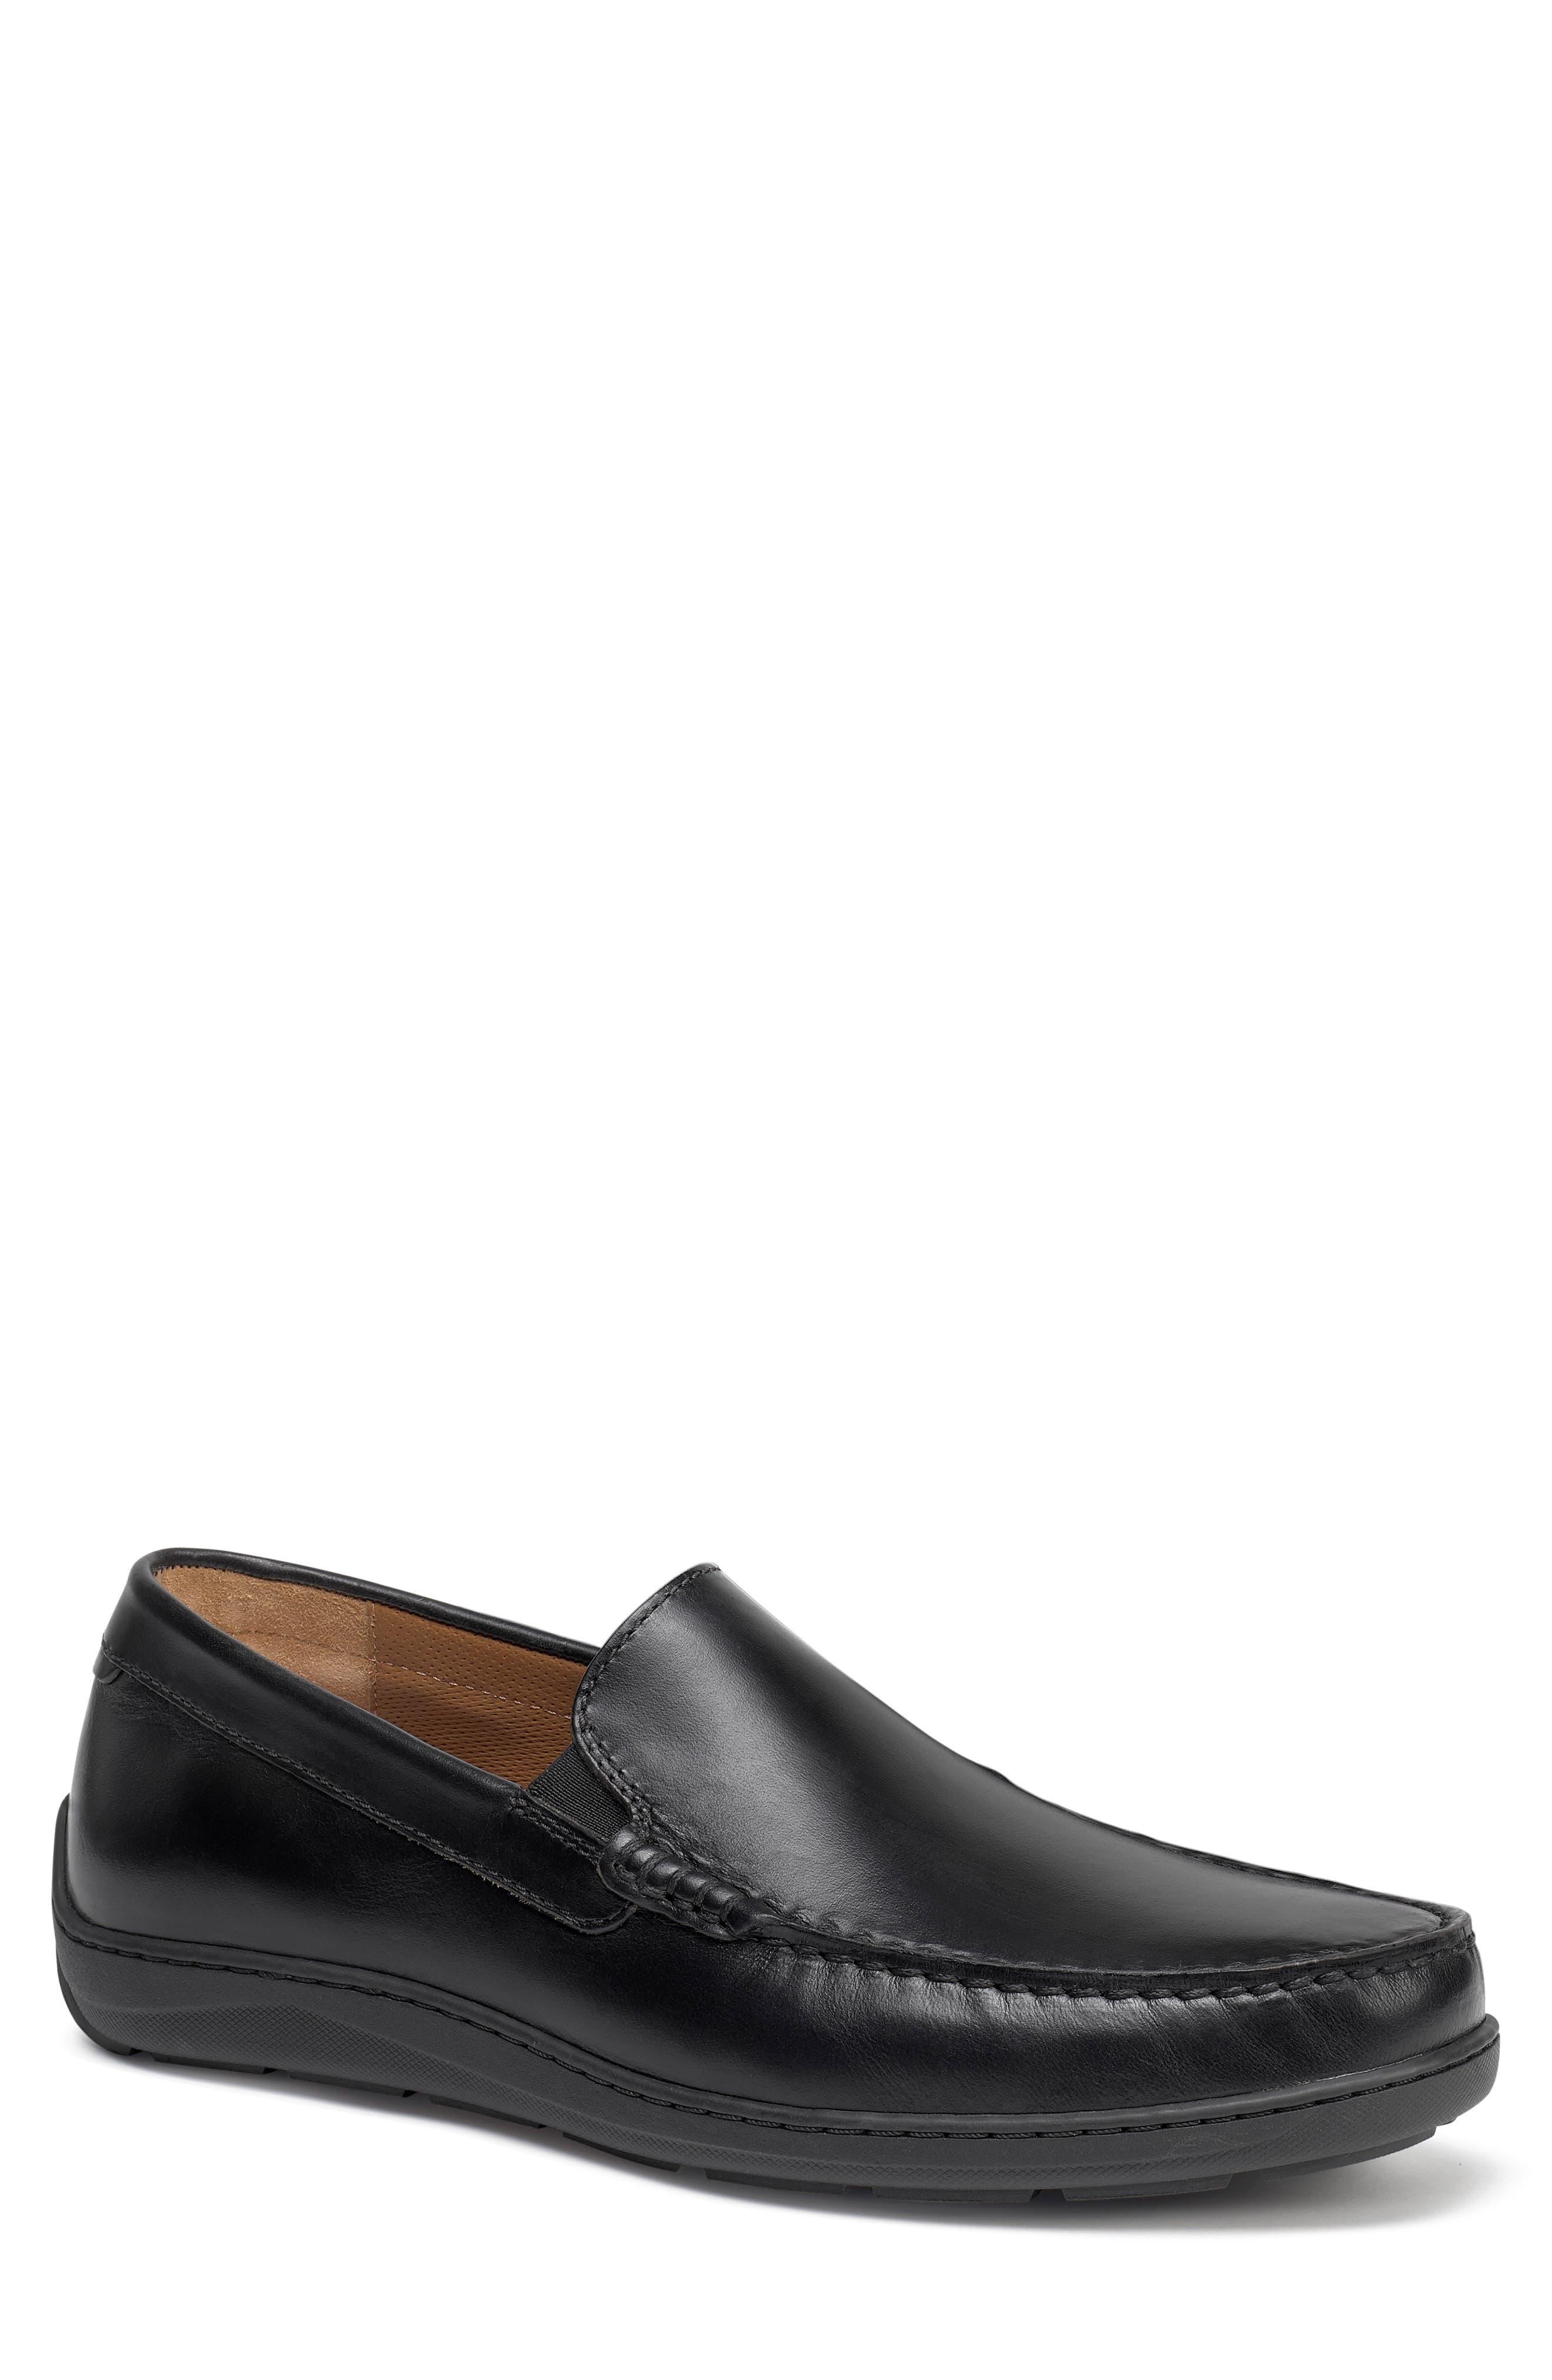 Sherwood Slip-On,                         Main,                         color, Black Leather